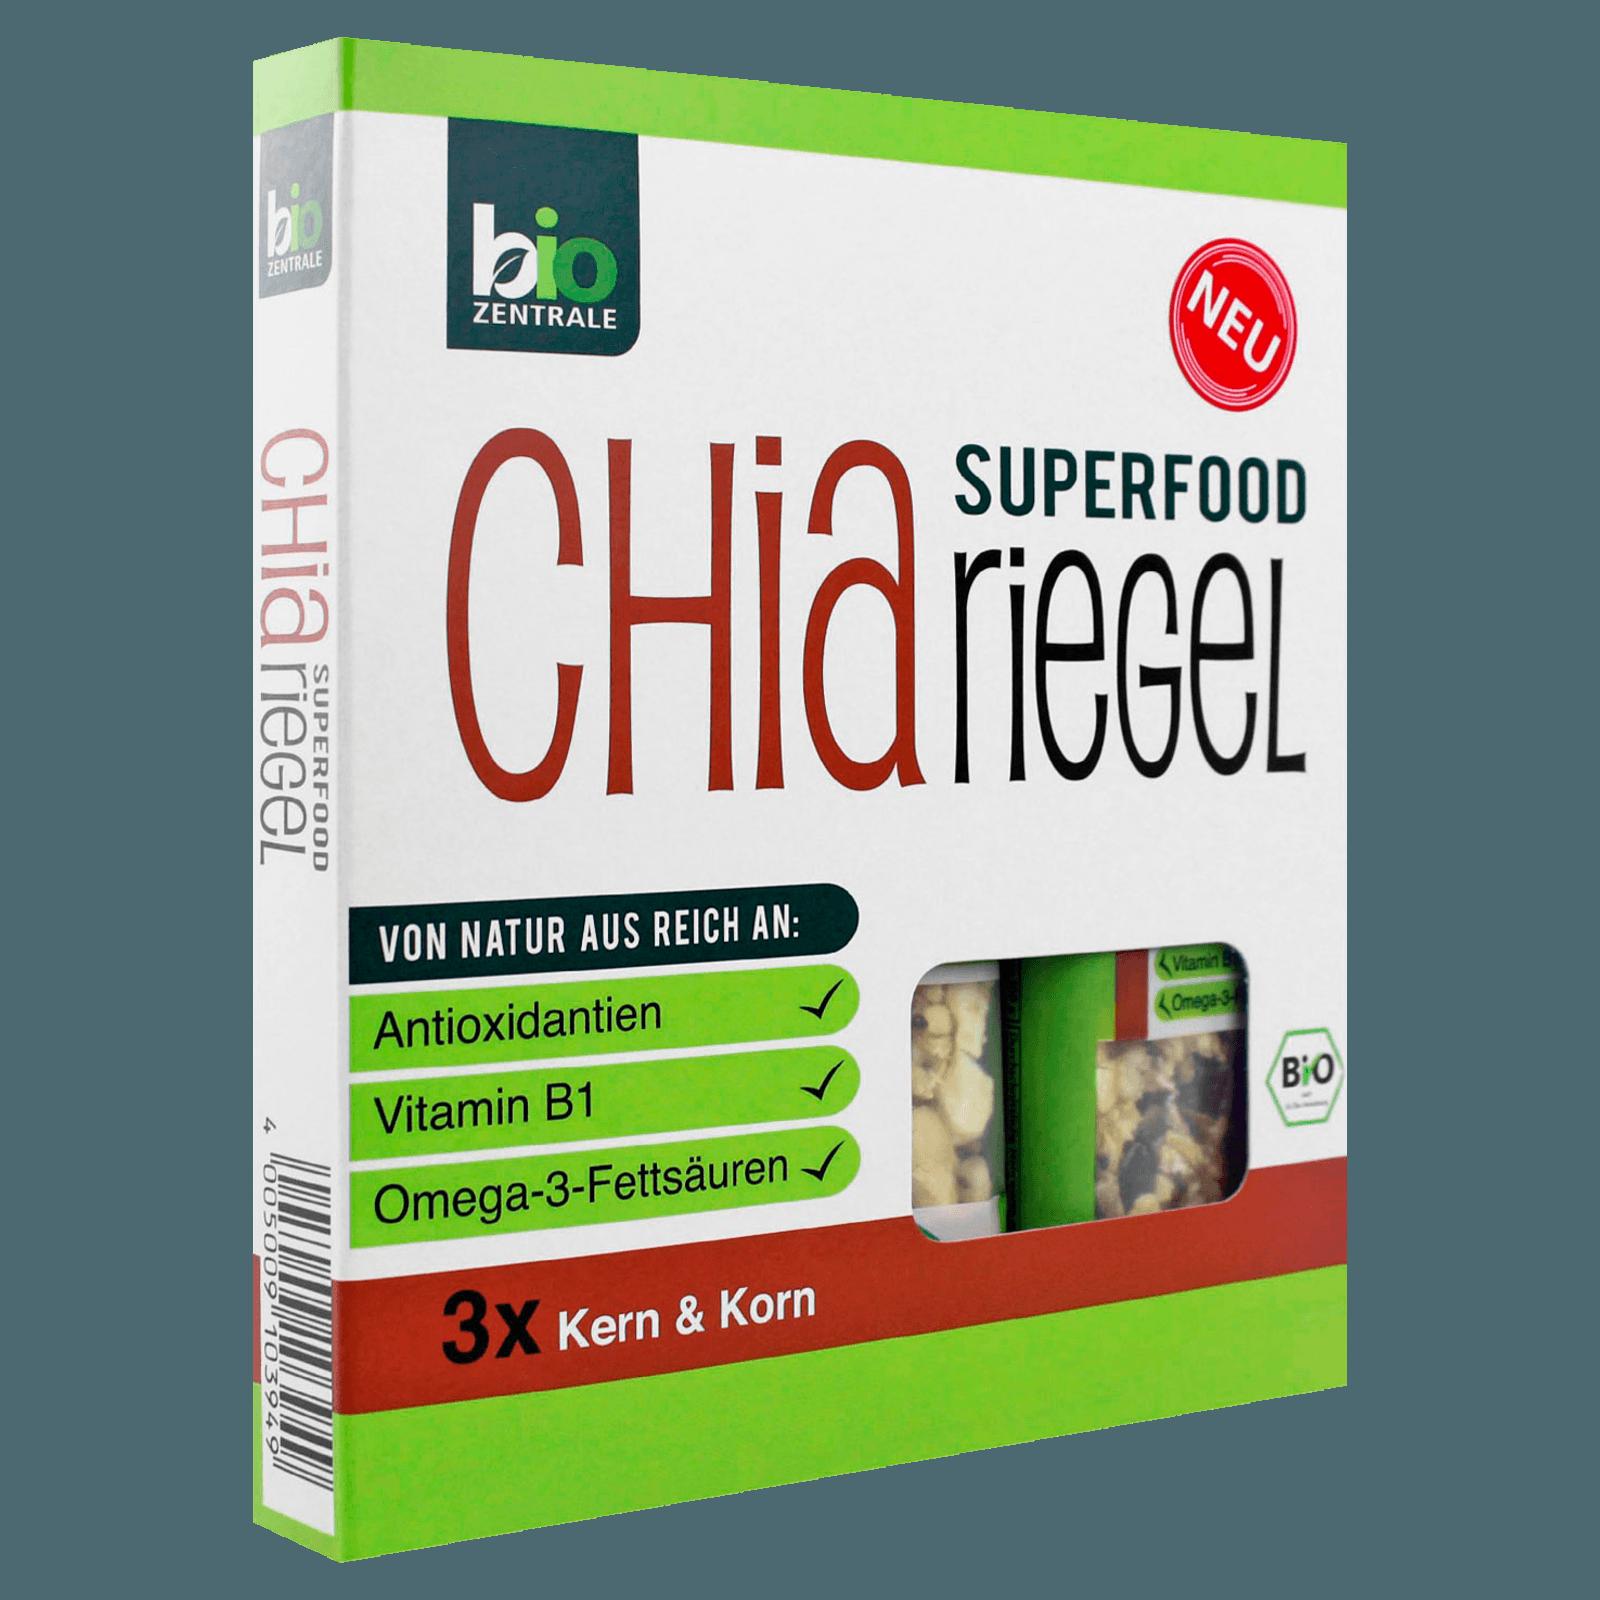 Bio Zentrale Chia-Riegel Kern & Korn 3x40g